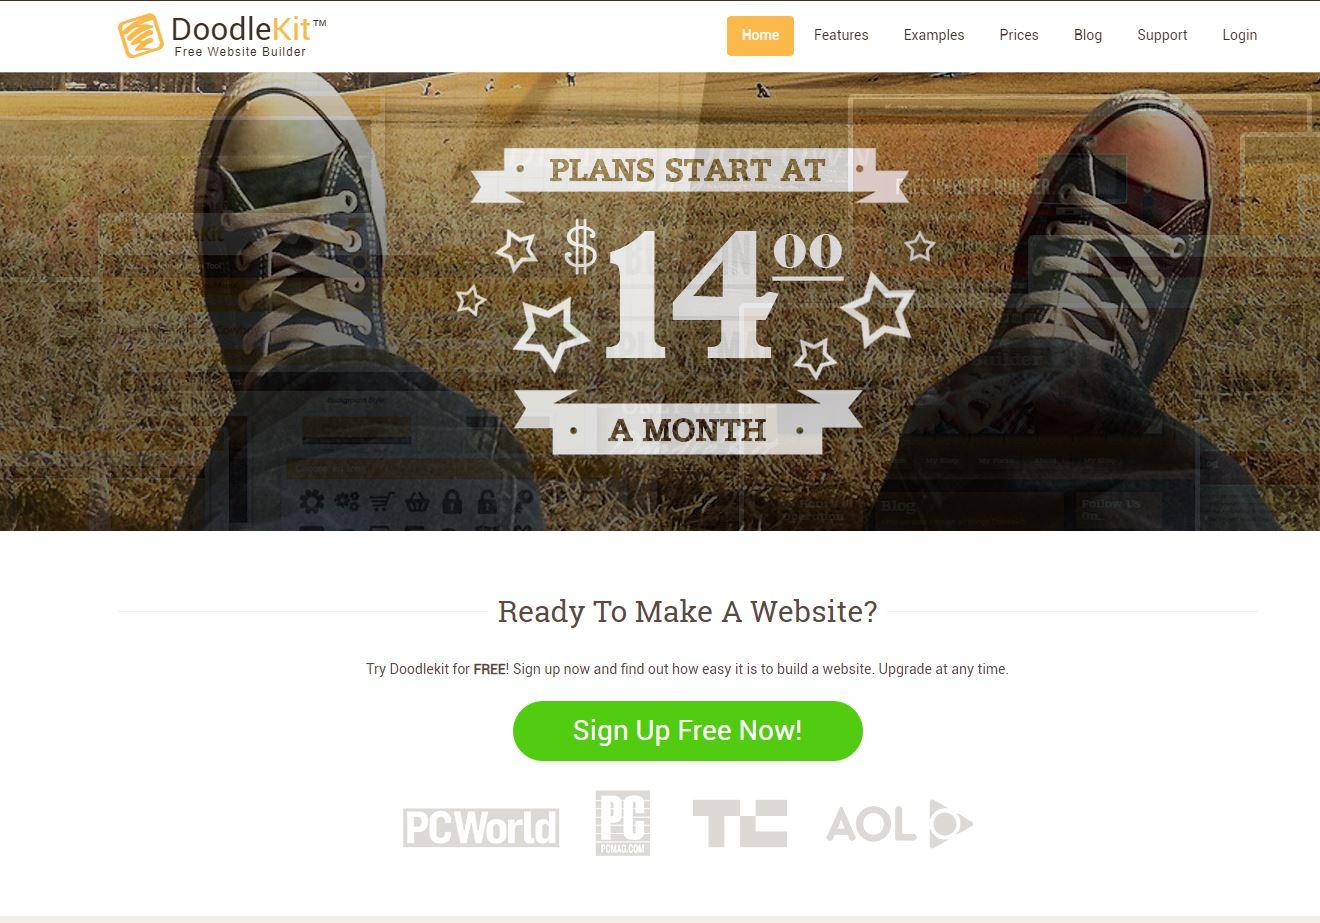 10 Best Website Builders for Small Business (Inside Look